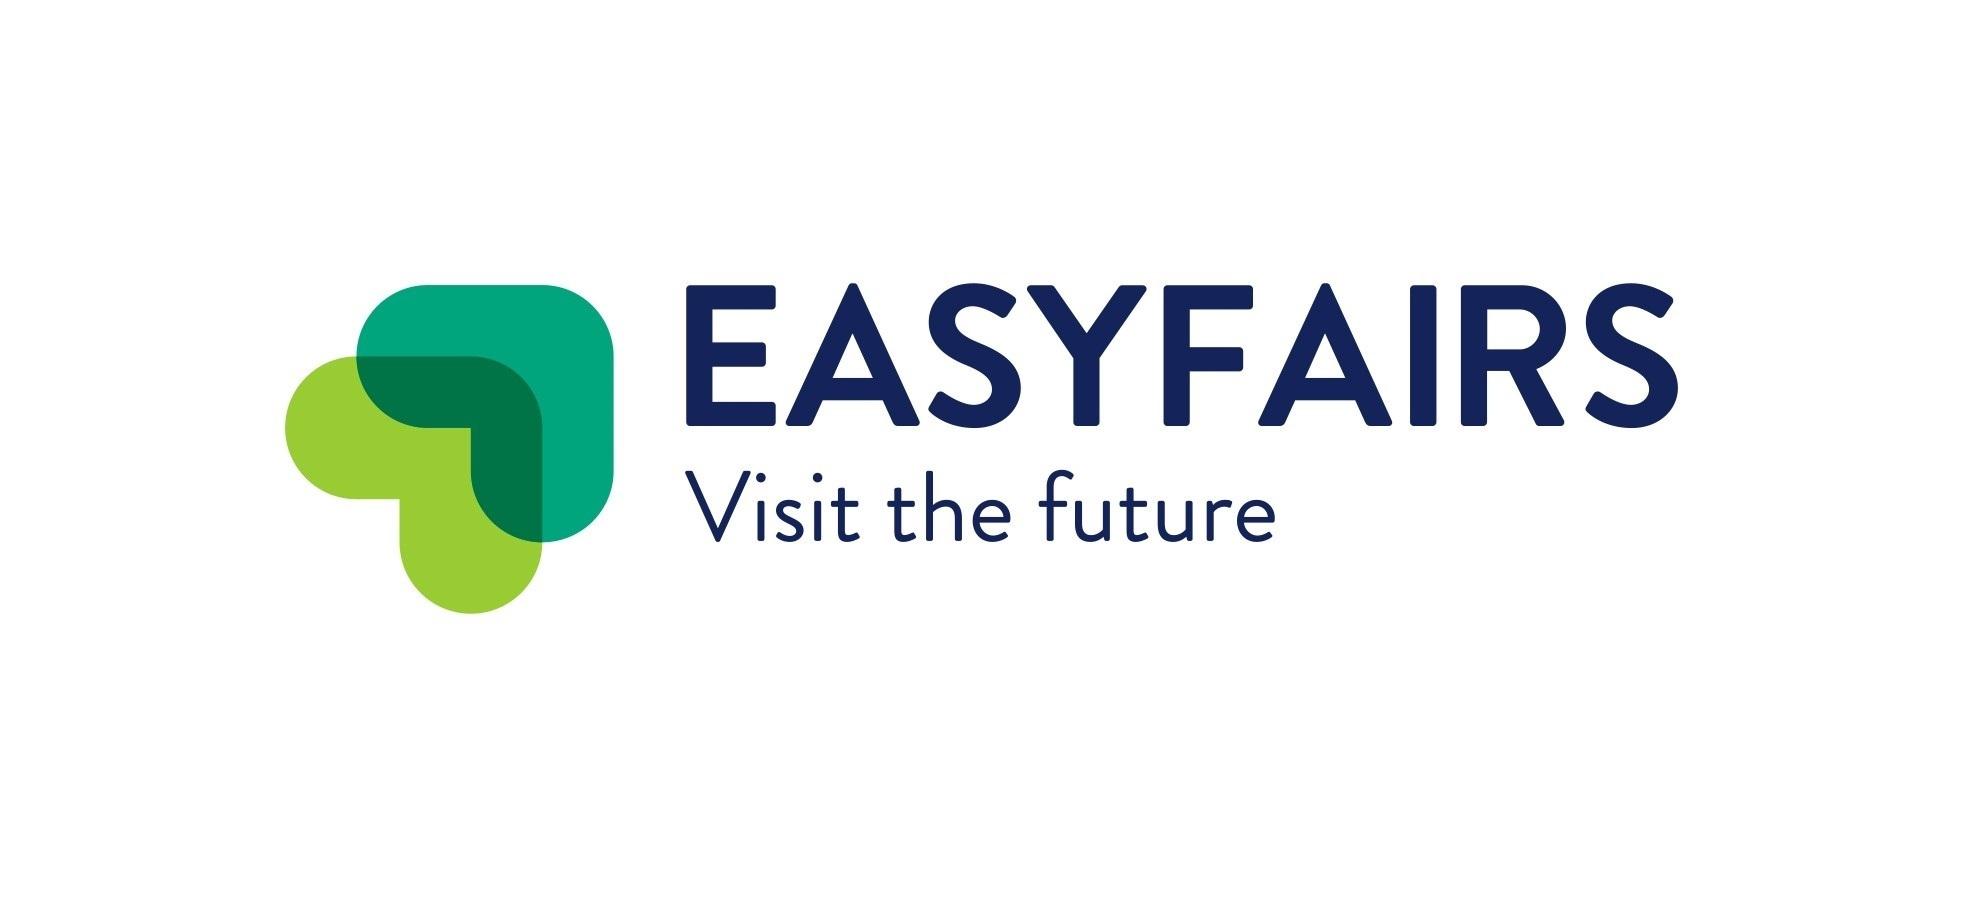 Easy fairs logo